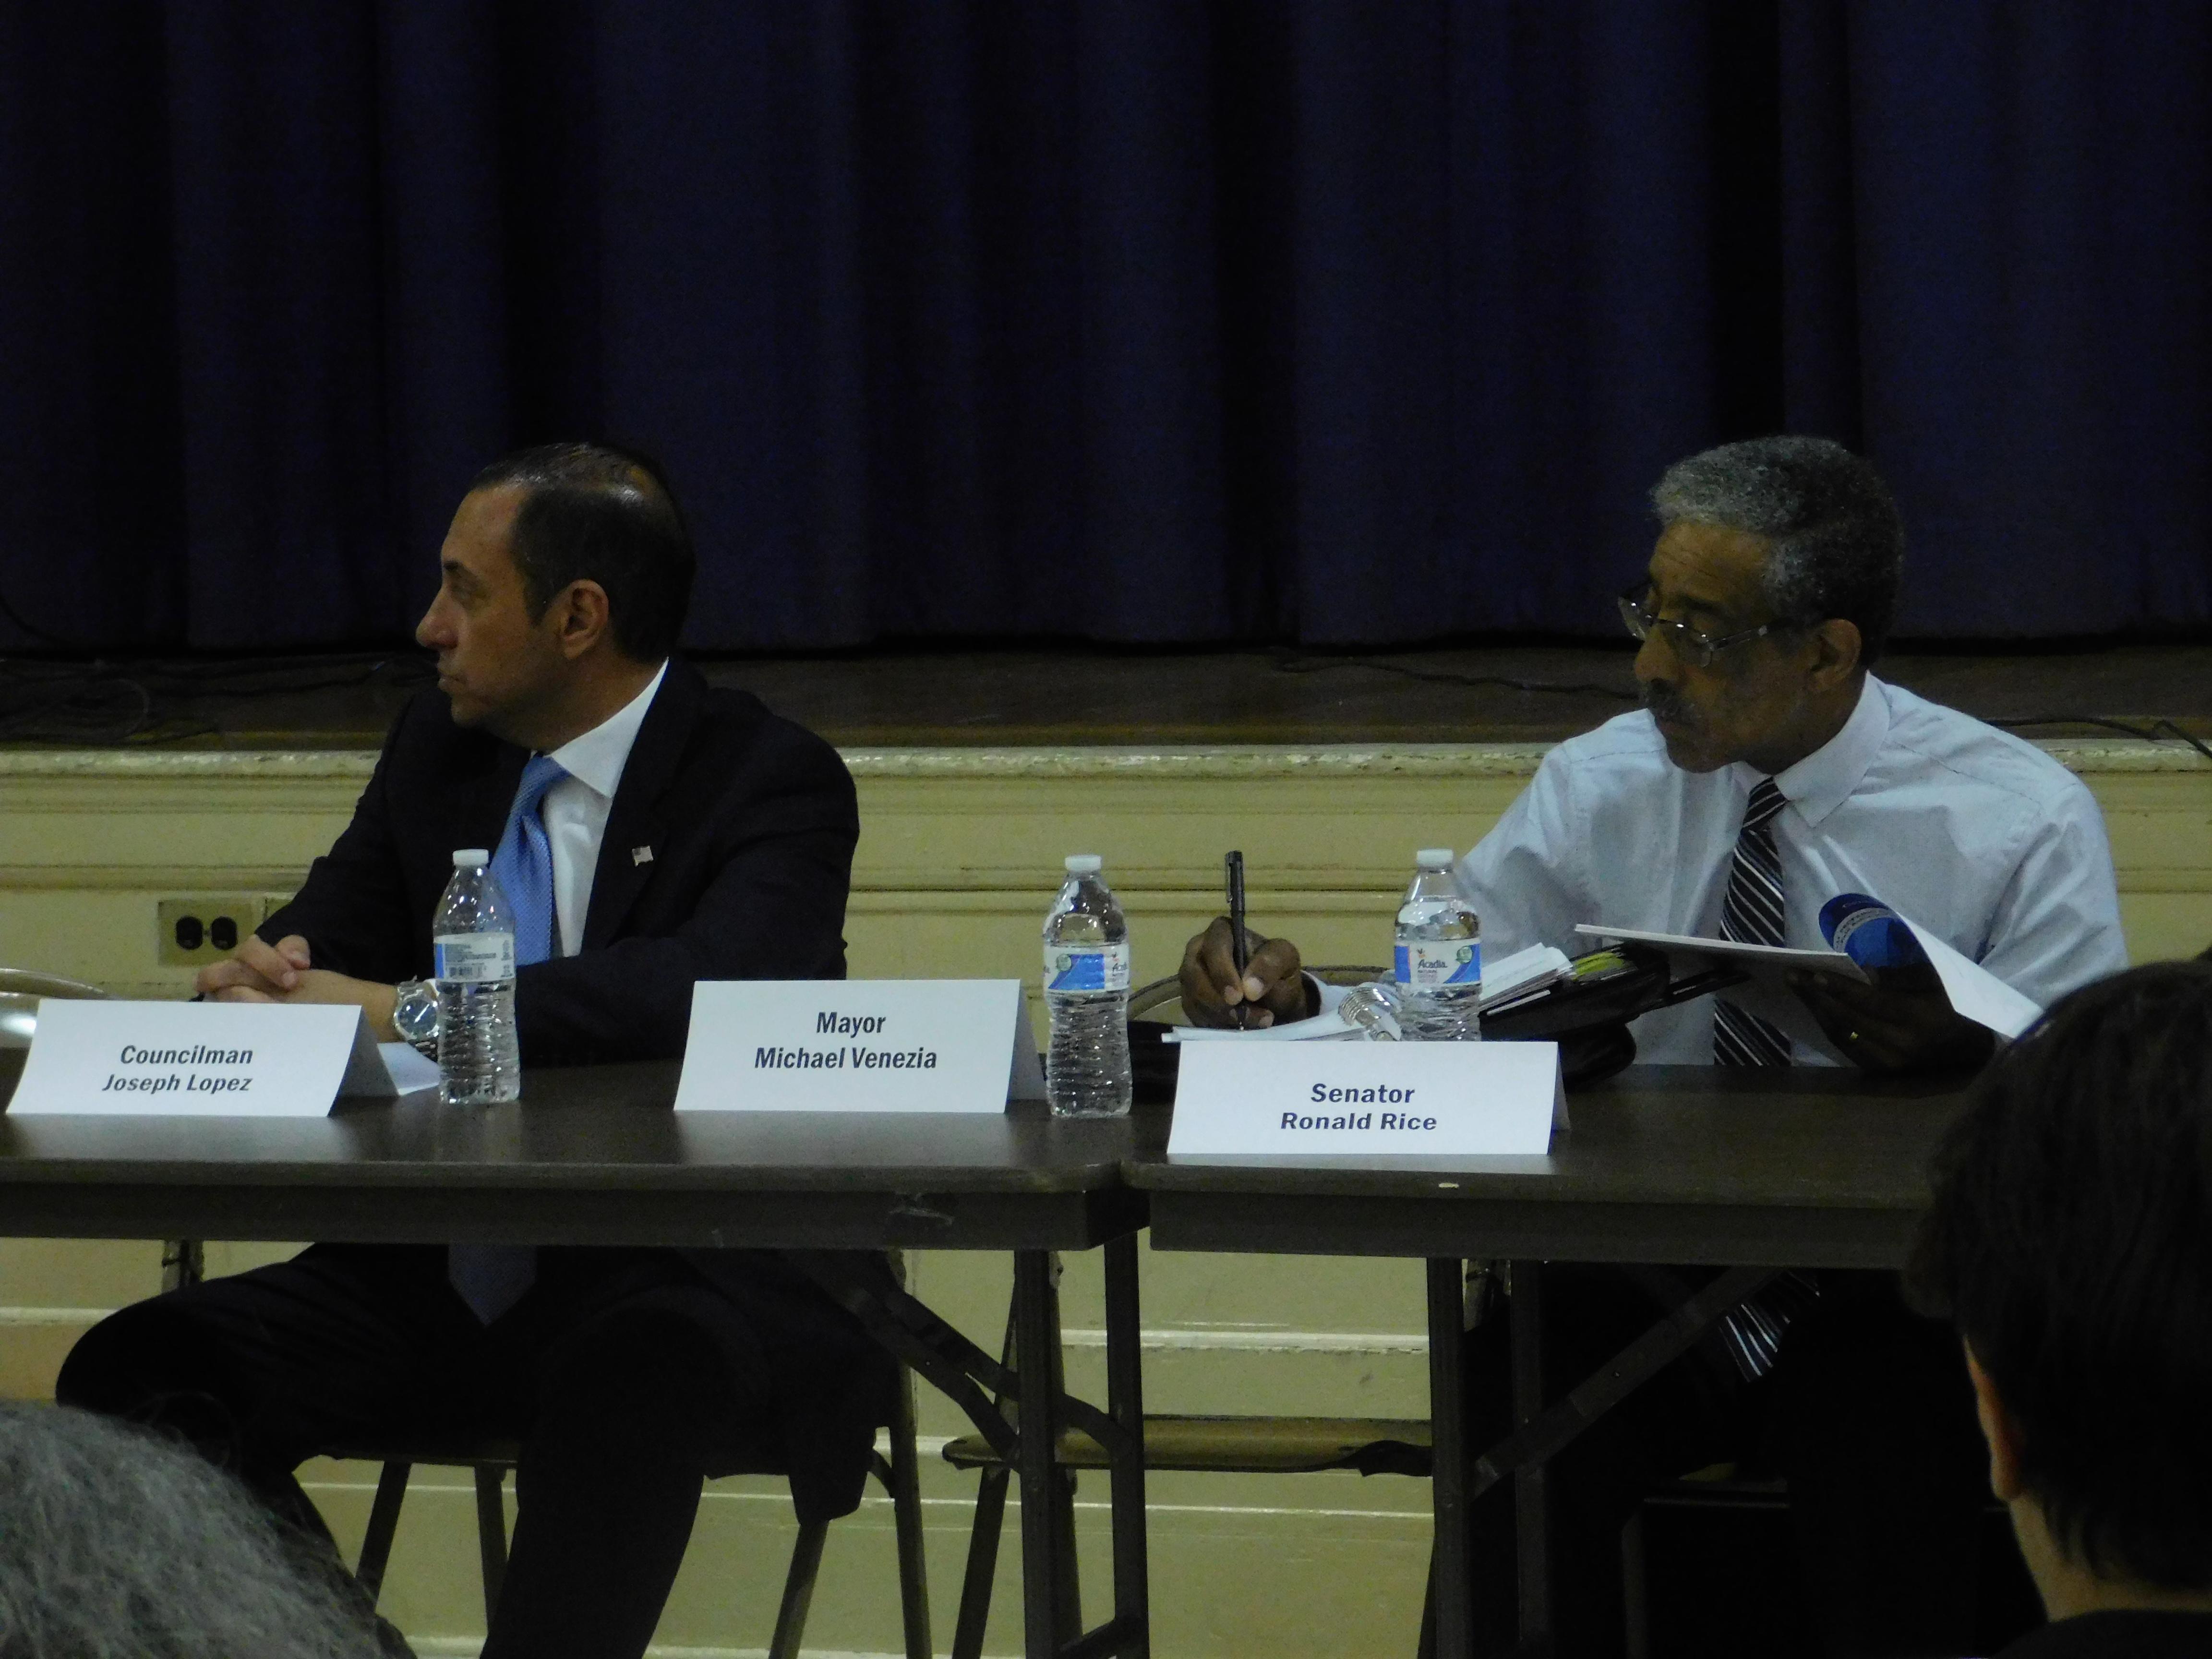 Senator Ron Rice (left) also spoke at the discussion.